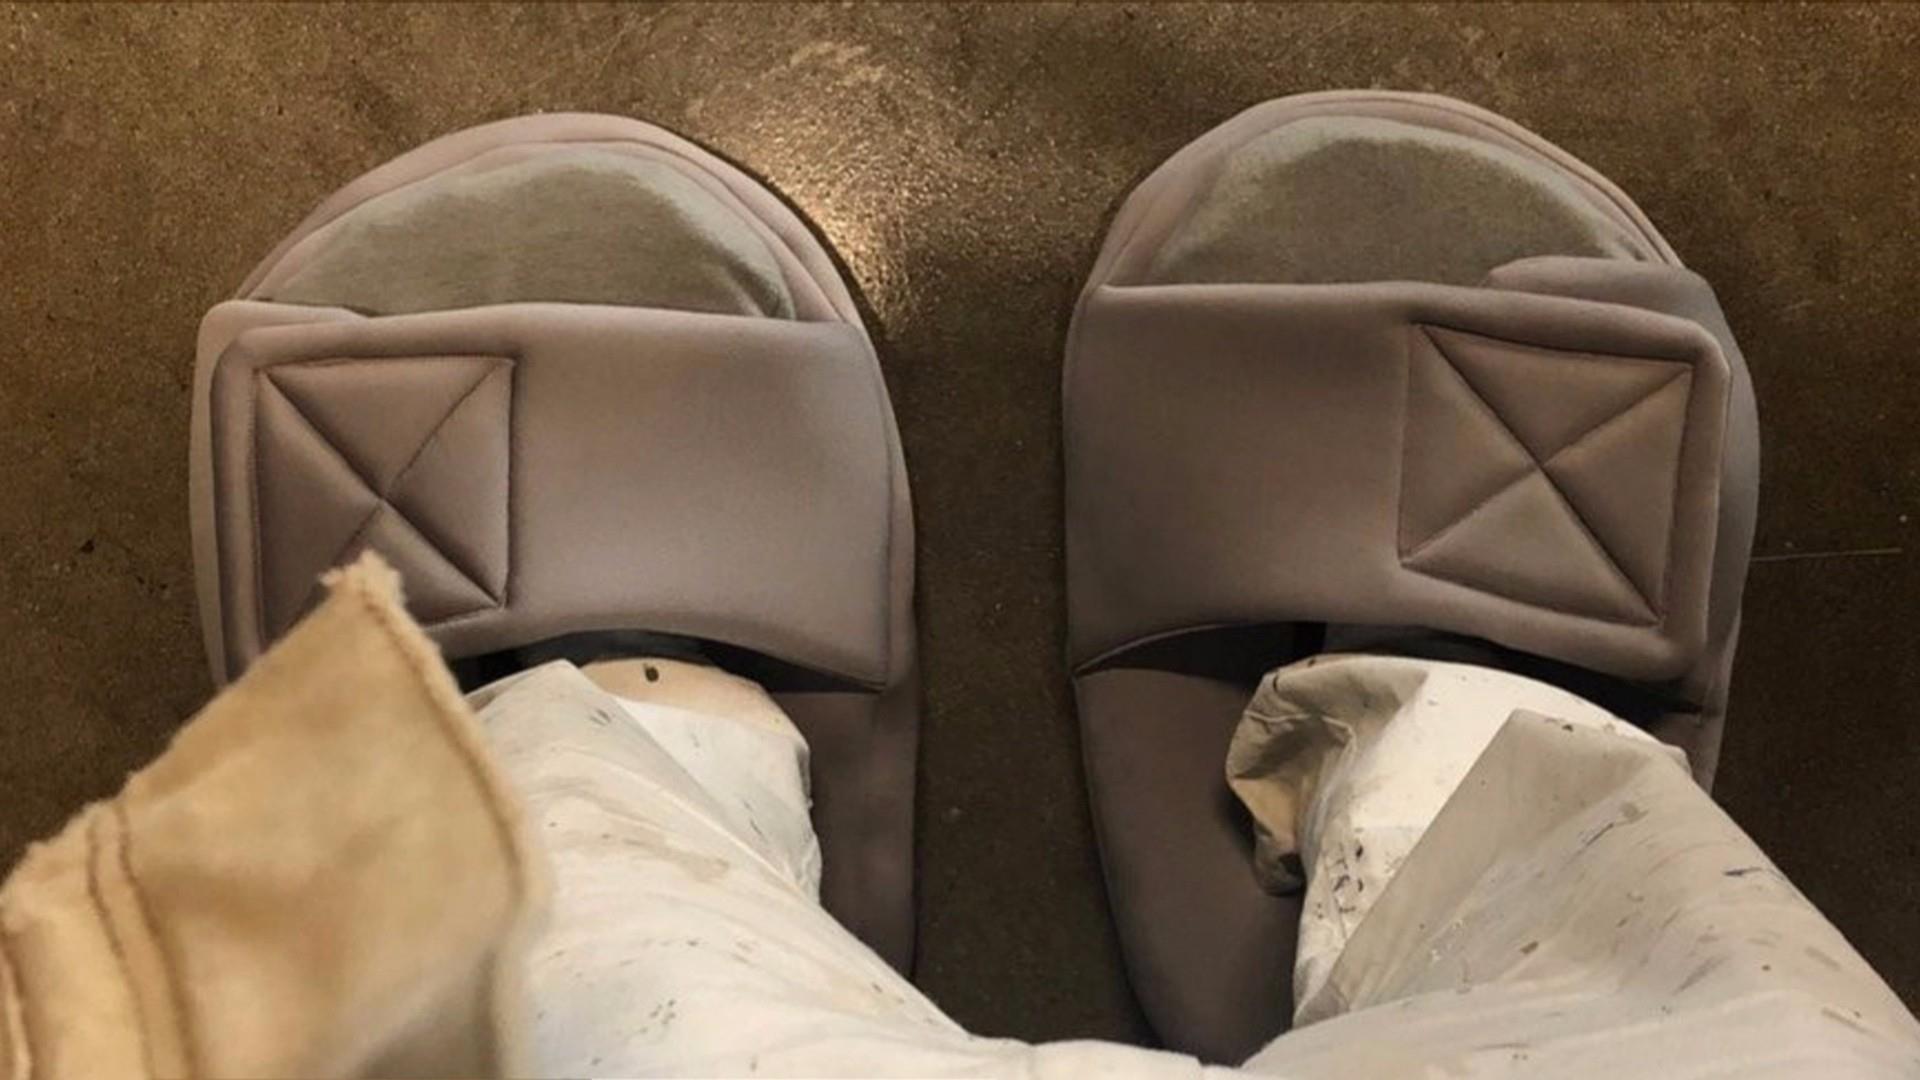 67b9524bcea Kanye West dons huge shoes after social media ridicule